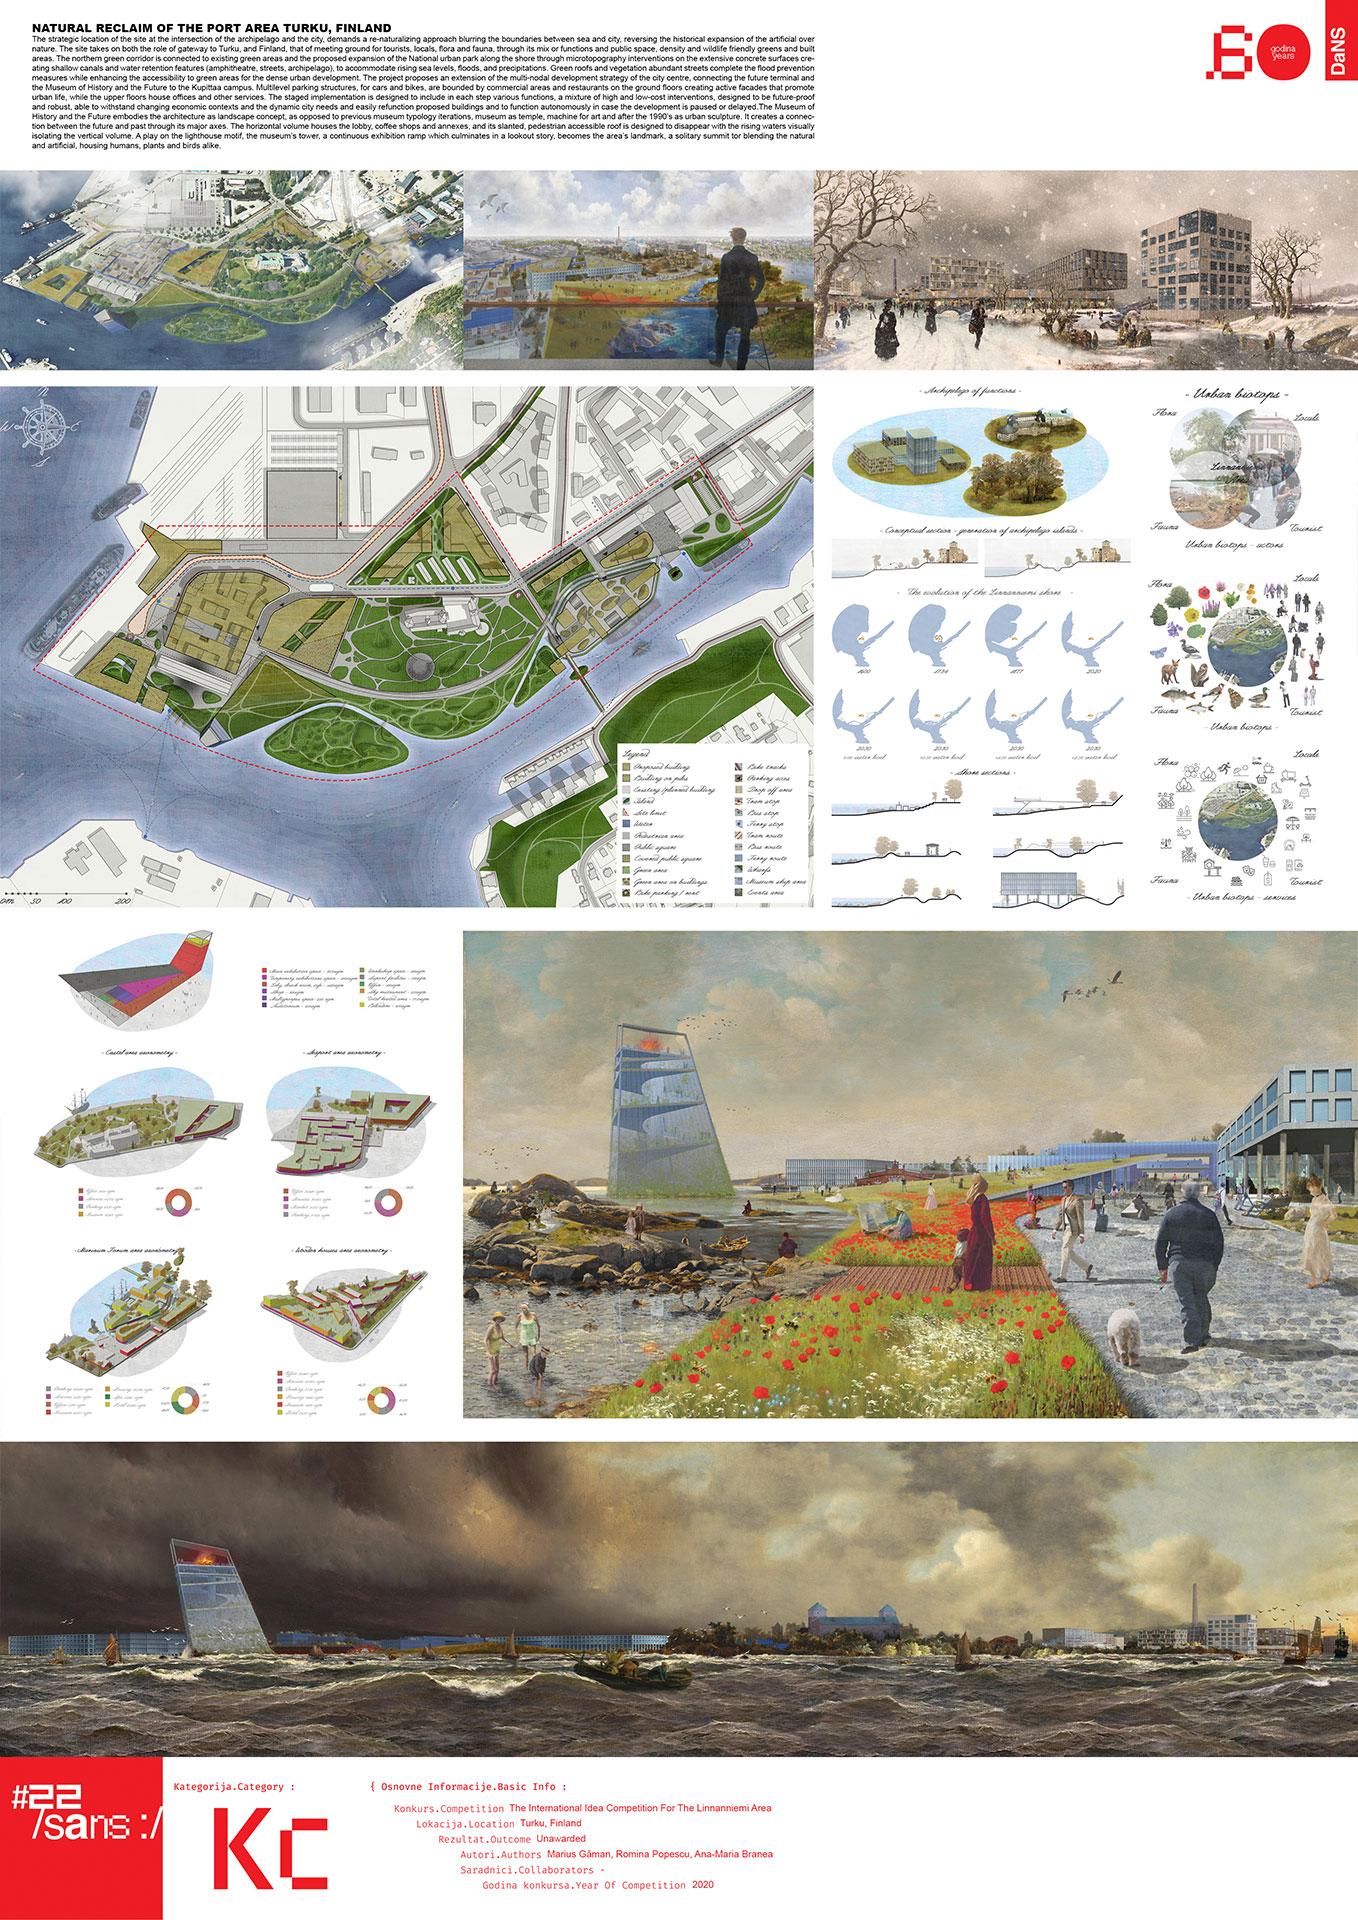 "<p class=""naslov-br"">kc11</p>Prirodni povraćaj lučne oblasti u Turku, Finska // Natural Reclaiming of the Port Area Turku, Finland"